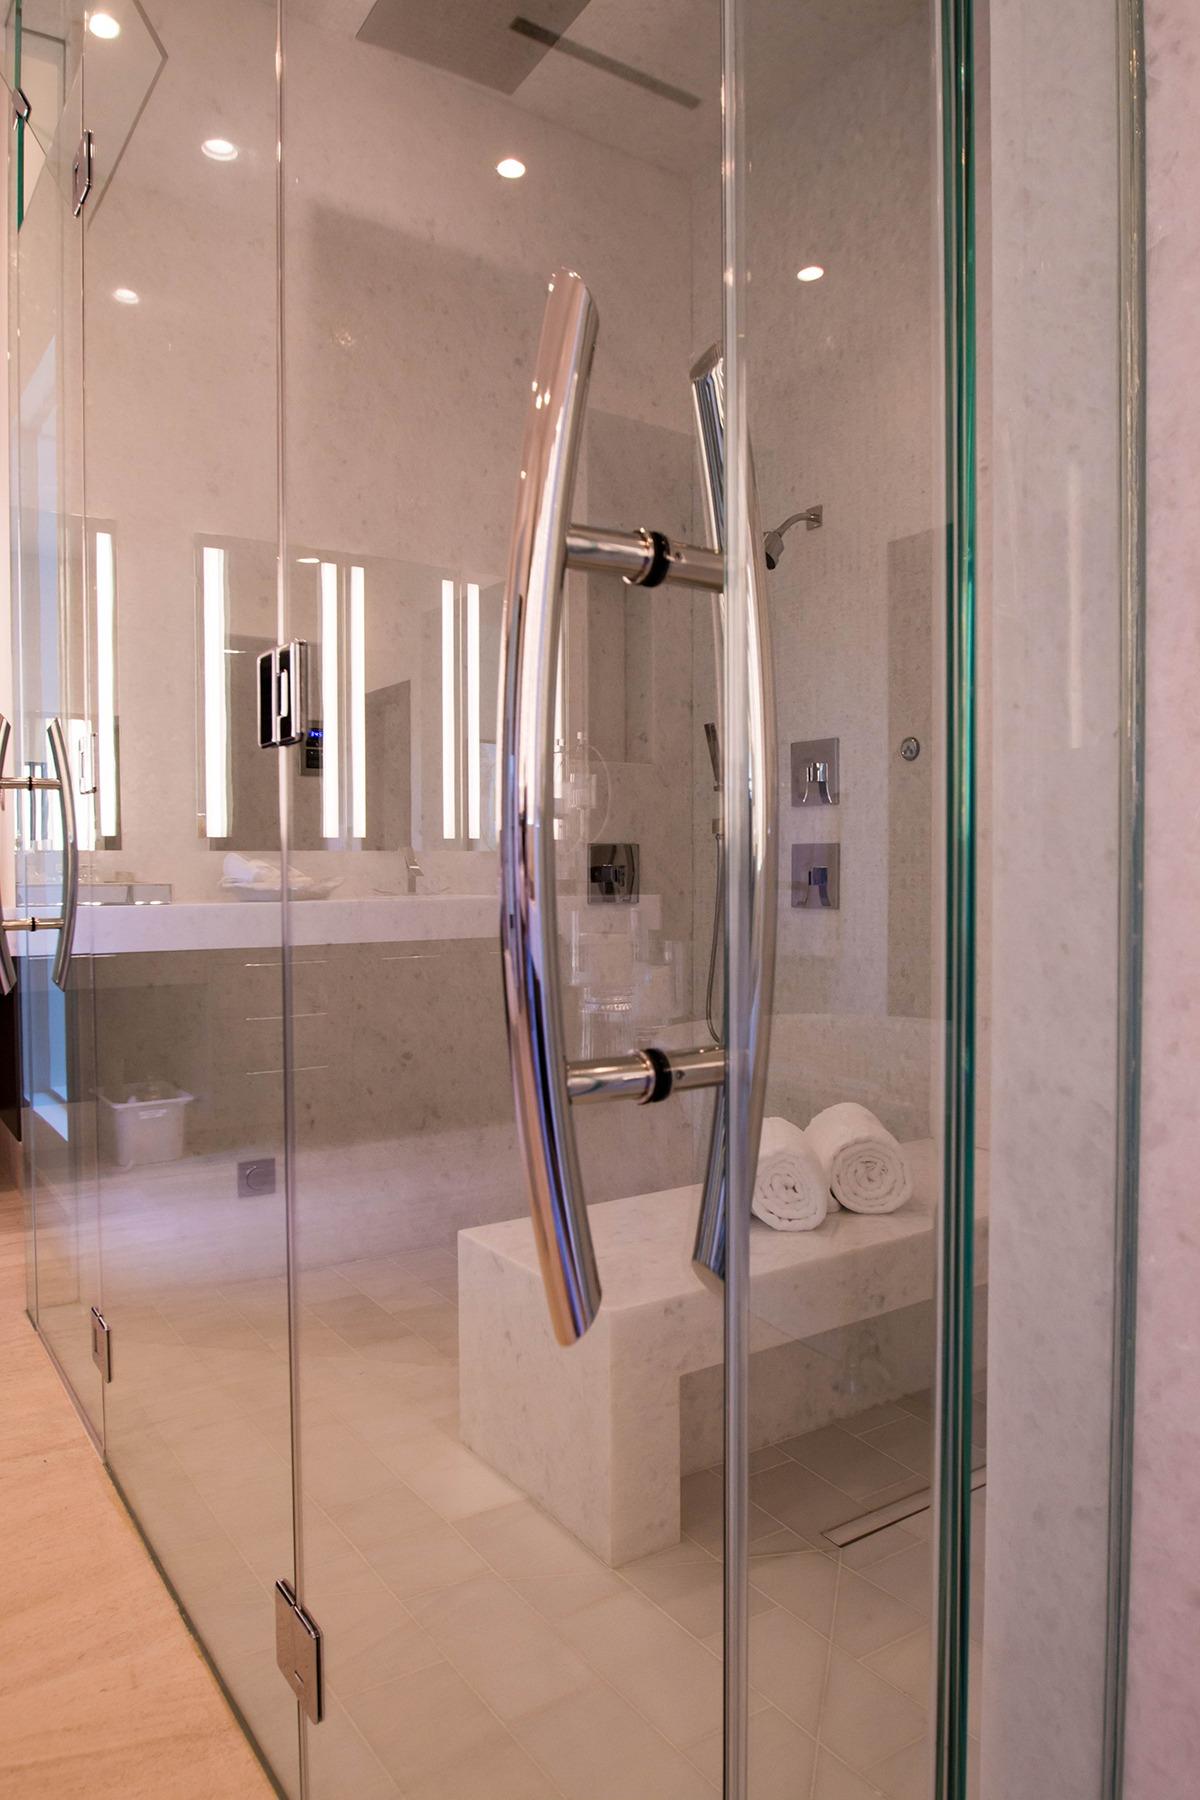 Henderson sunwest custom homes residential glass project a custom shower door handles planetlyrics Choice Image